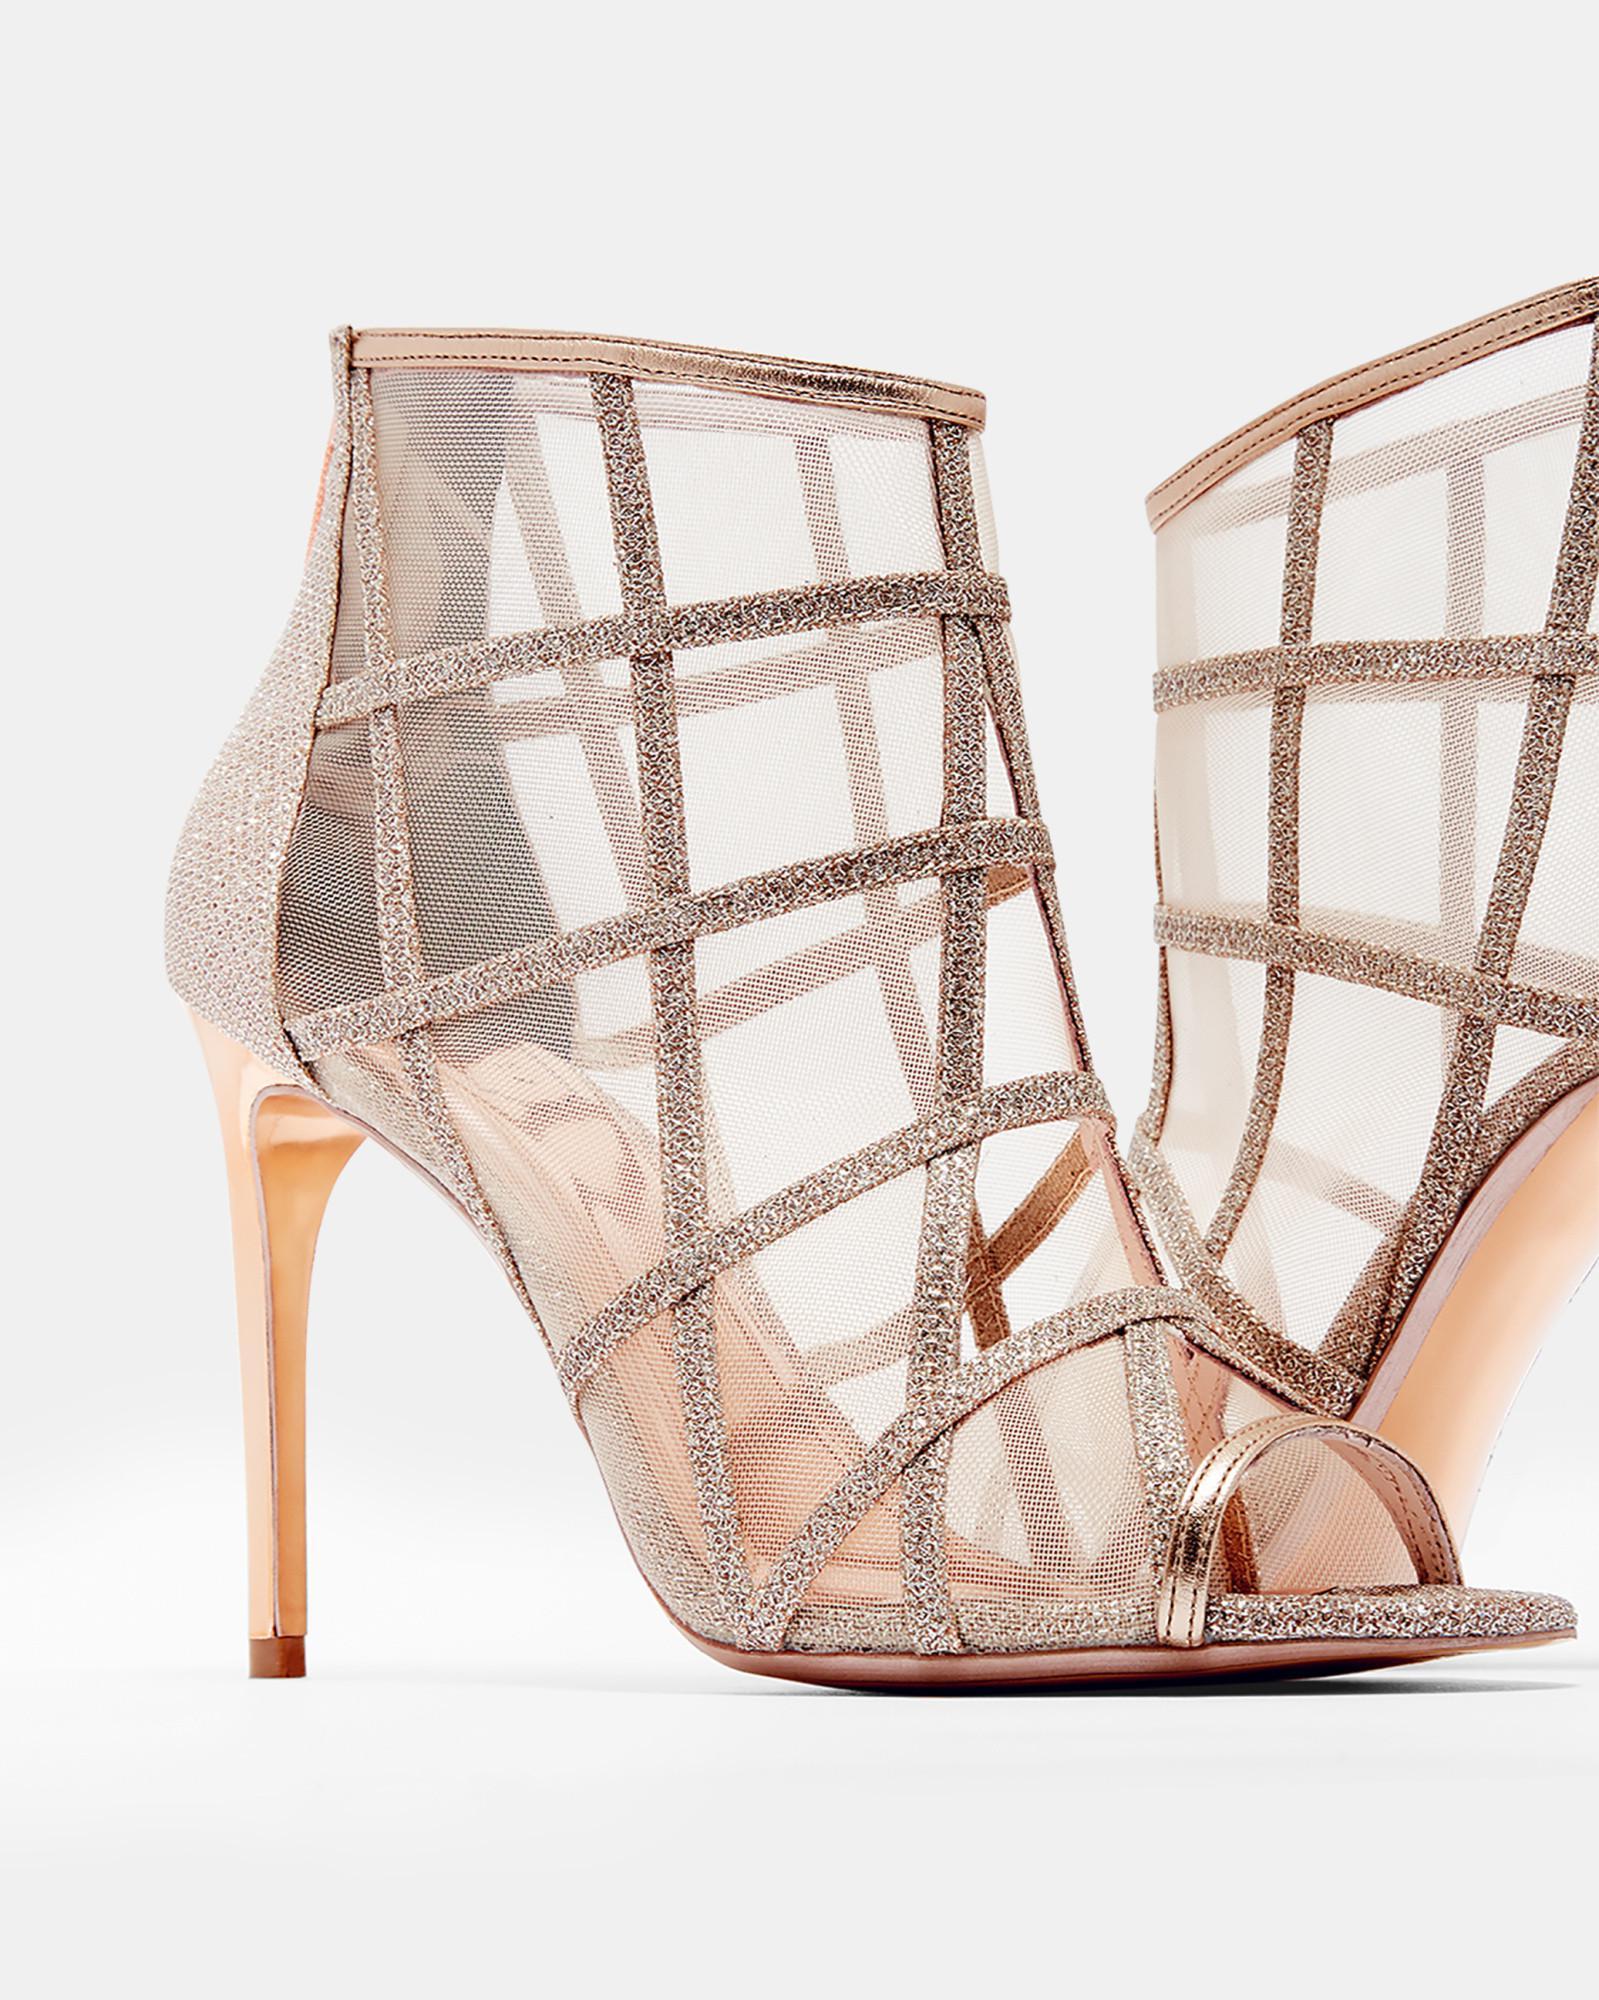 d93a8b572985cc Lyst - Ted Baker Metallic Mesh Peep-toe Boots in Metallic